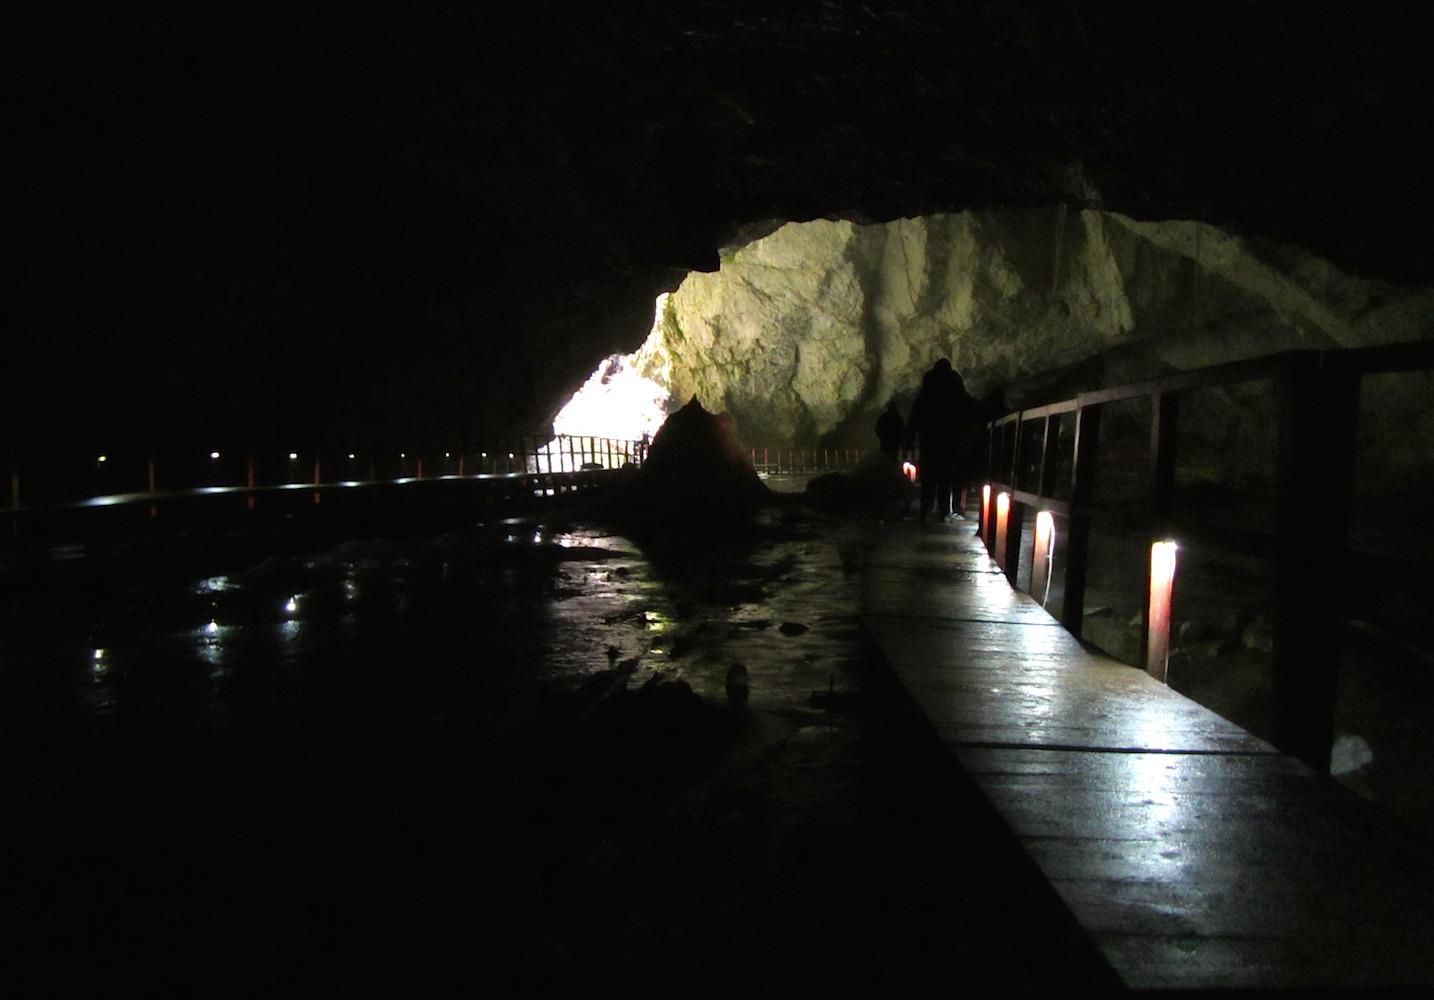 Scarisoara cave in Apuseni mountains